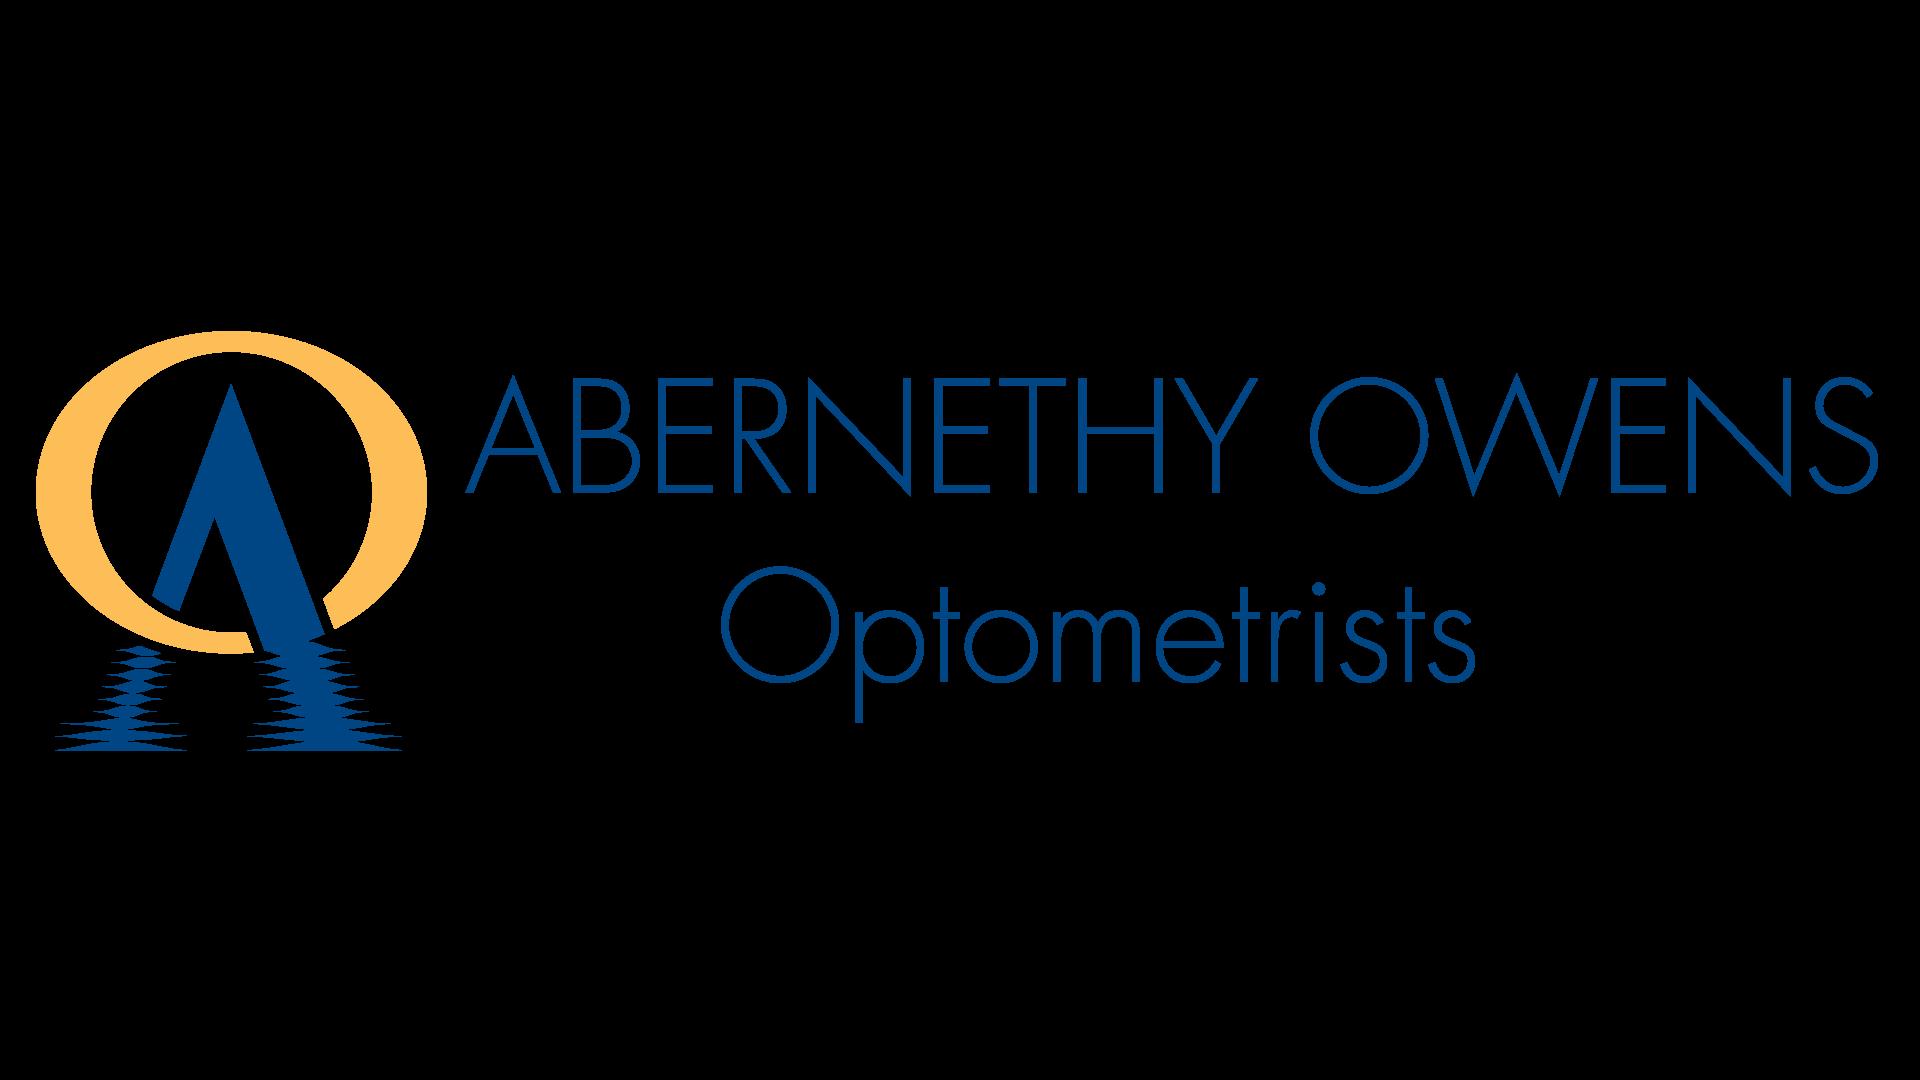 logo for Abernethy Owens Optometrists Rockingham Optometrists